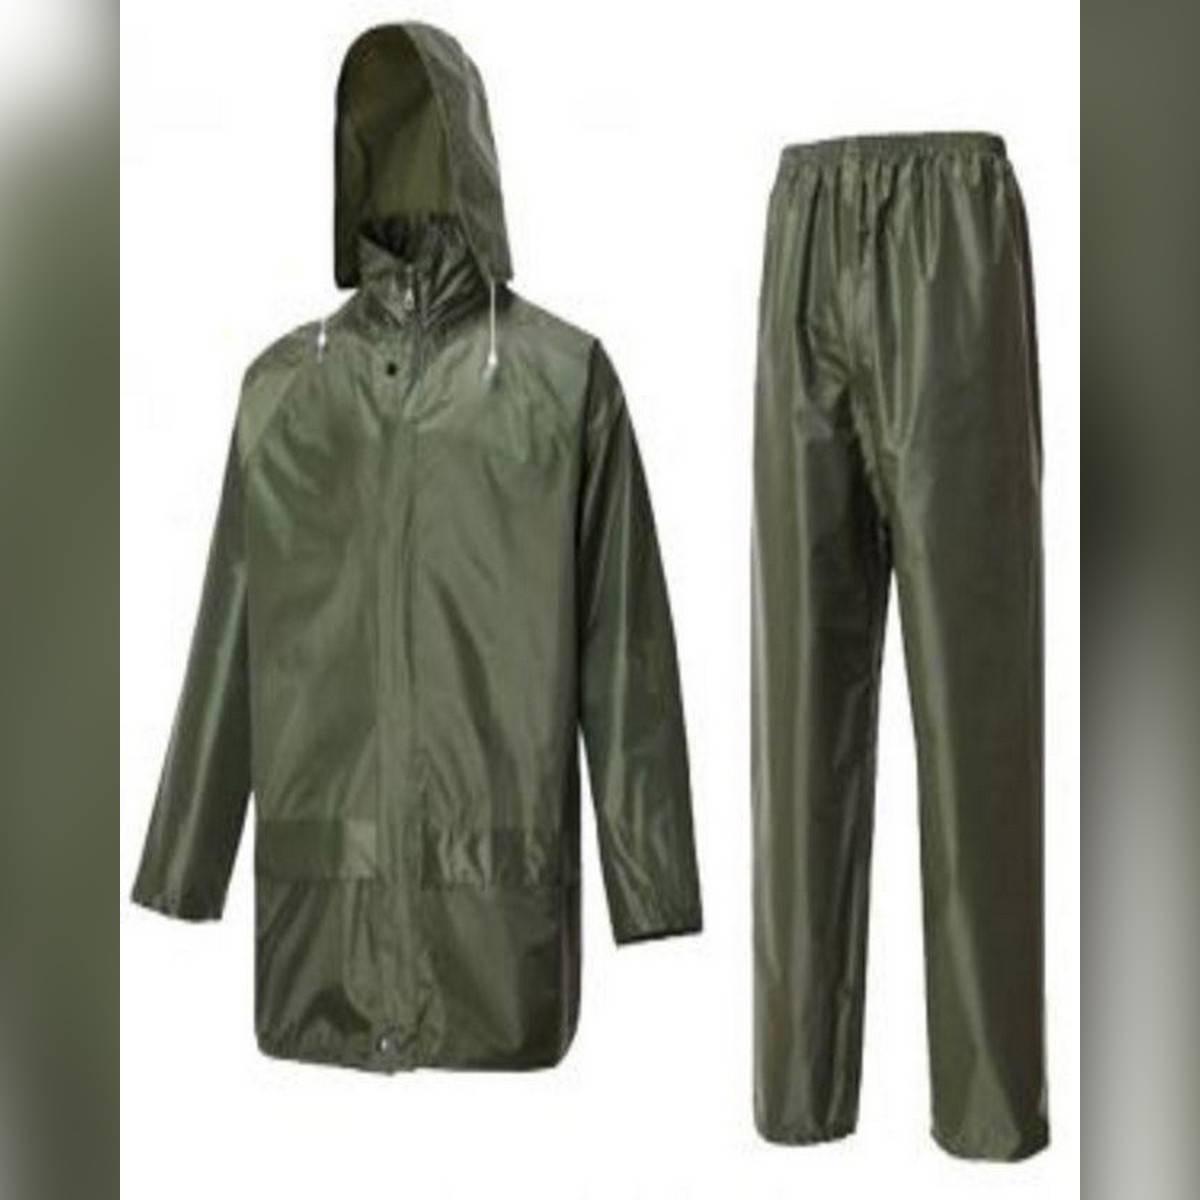 Raincoats overalls motorcycle fashion raincoat men and women fission rain suit Lite Waterproof Rain Suit / Rain Coat / Outdoor Activities / Rain Wear / Bike Suit / Jacket Pant for men Women Ladies